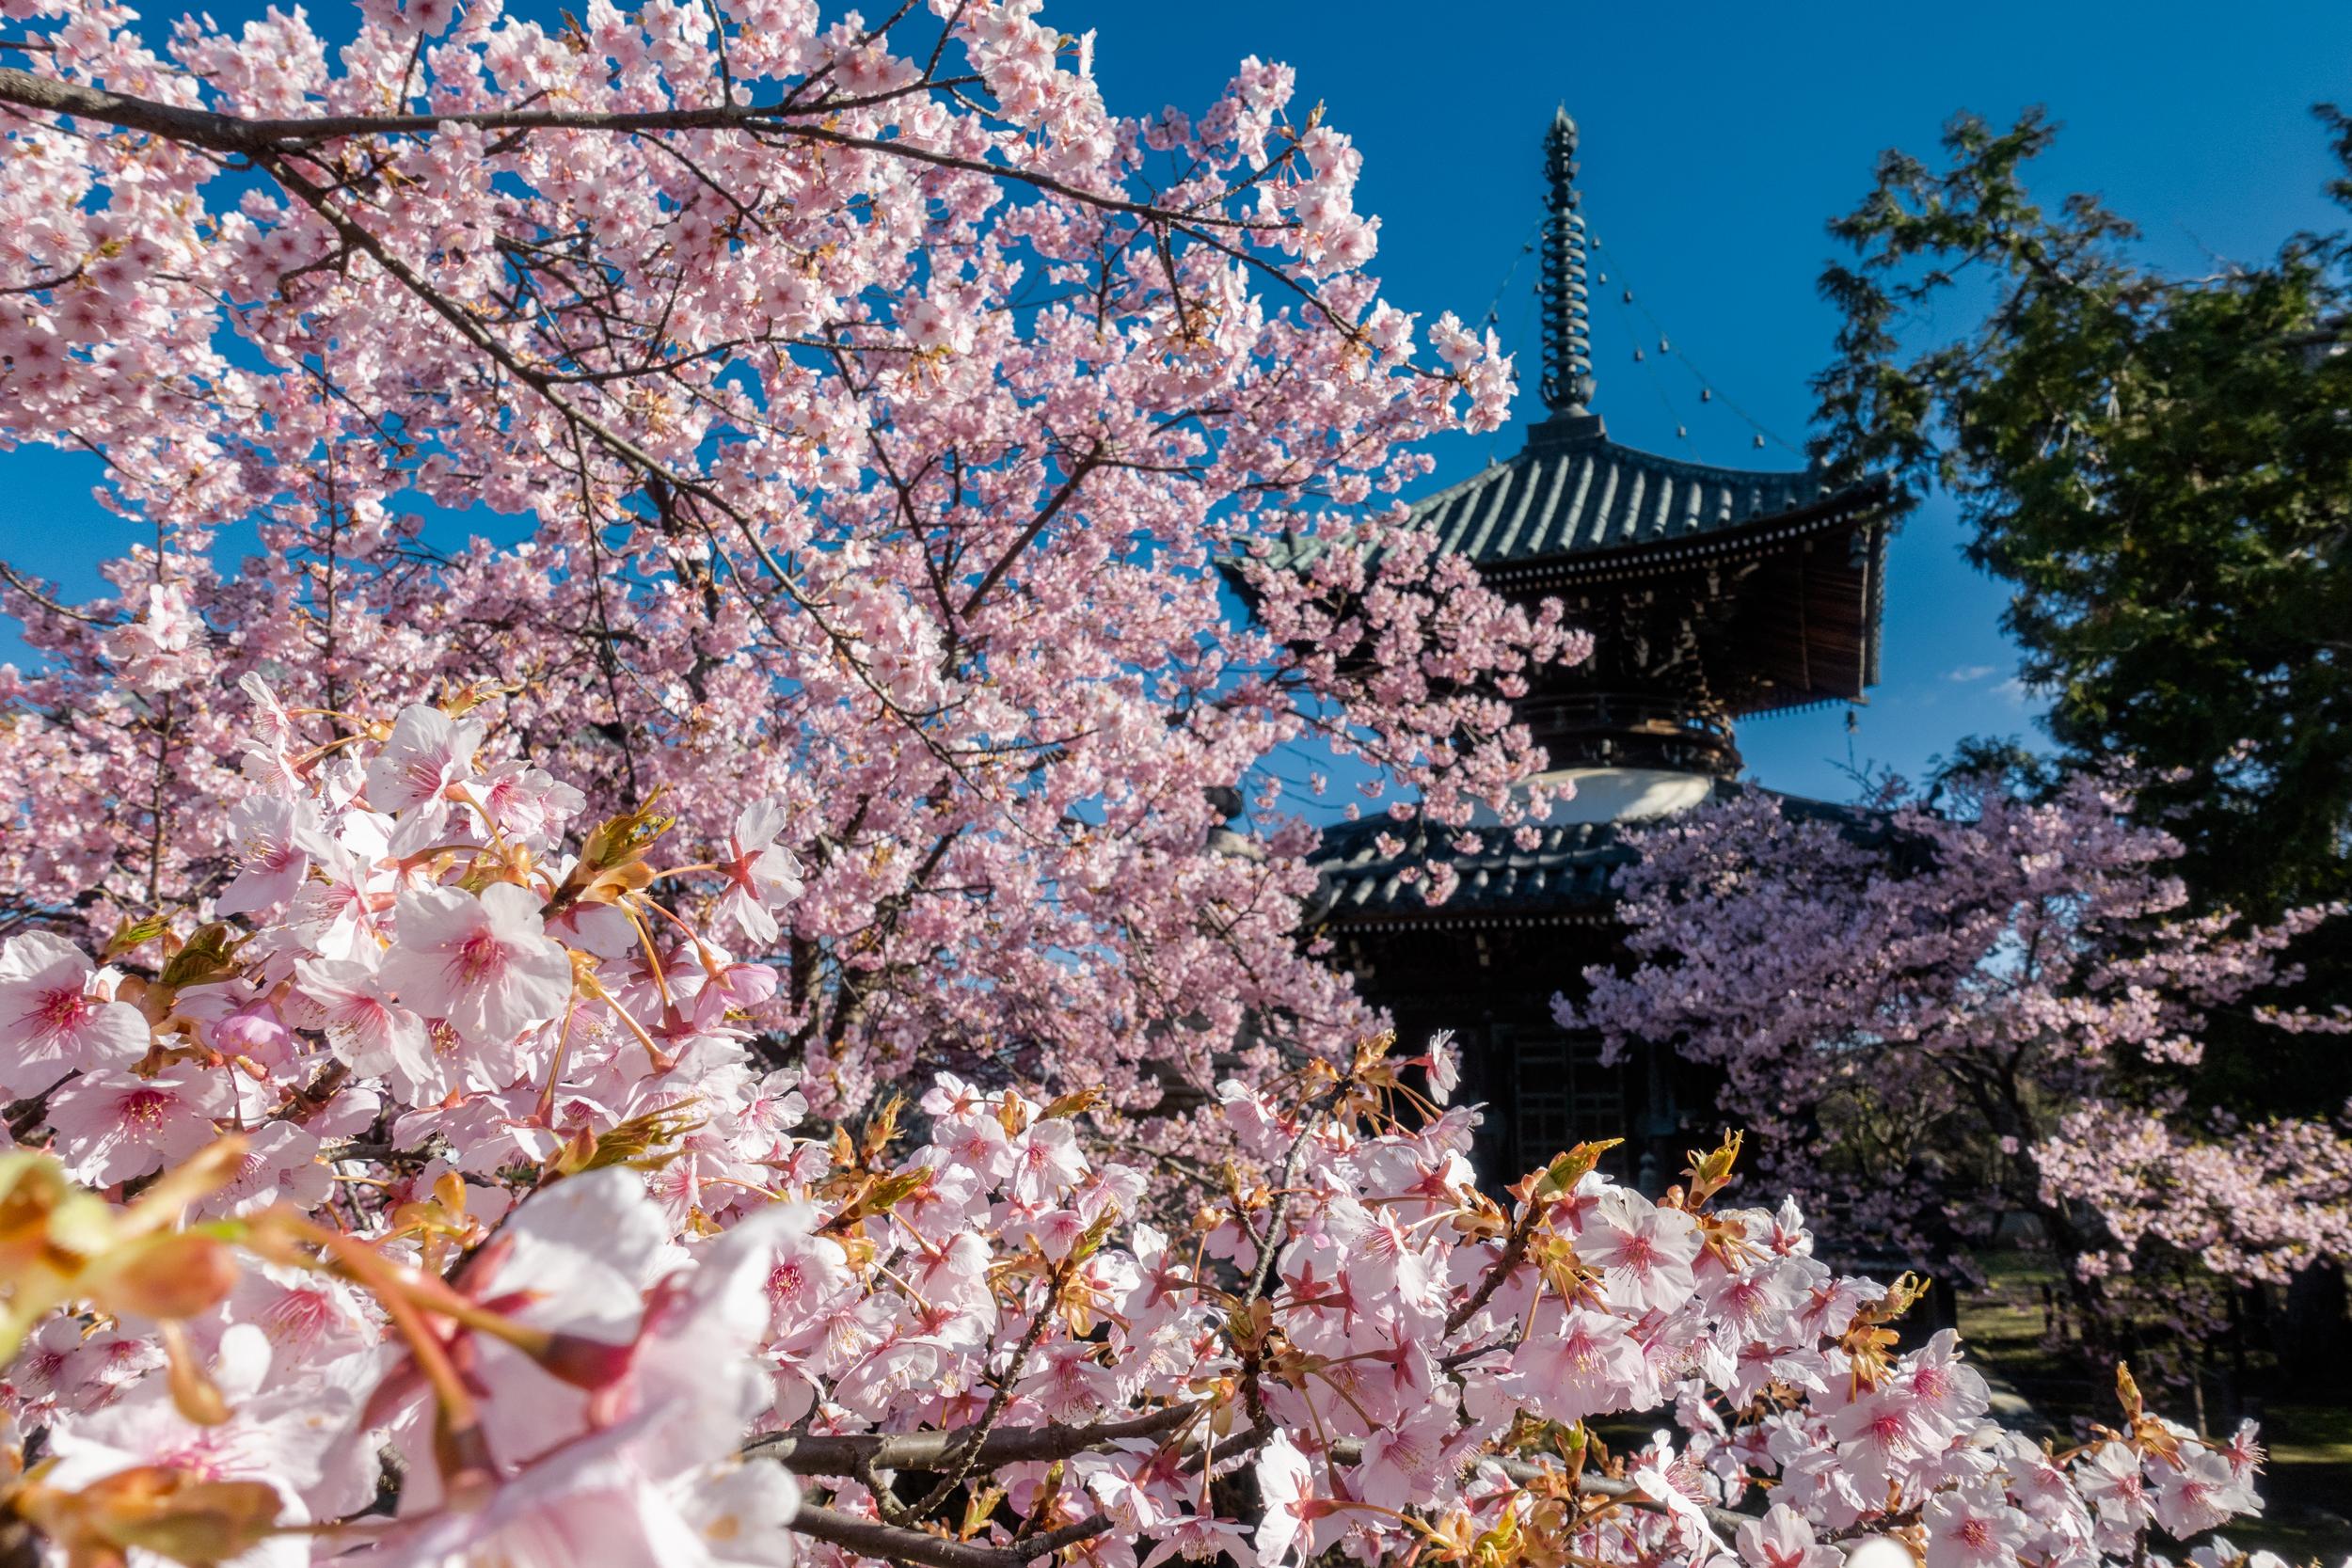 DSC03281 京都府 清凉寺(多宝塔と河津桜の美しい景色! 京都の春におすすめ桜写真スポット!撮影した写真の紹介、 アクセス方法や駐車場、桜の開花状況など)